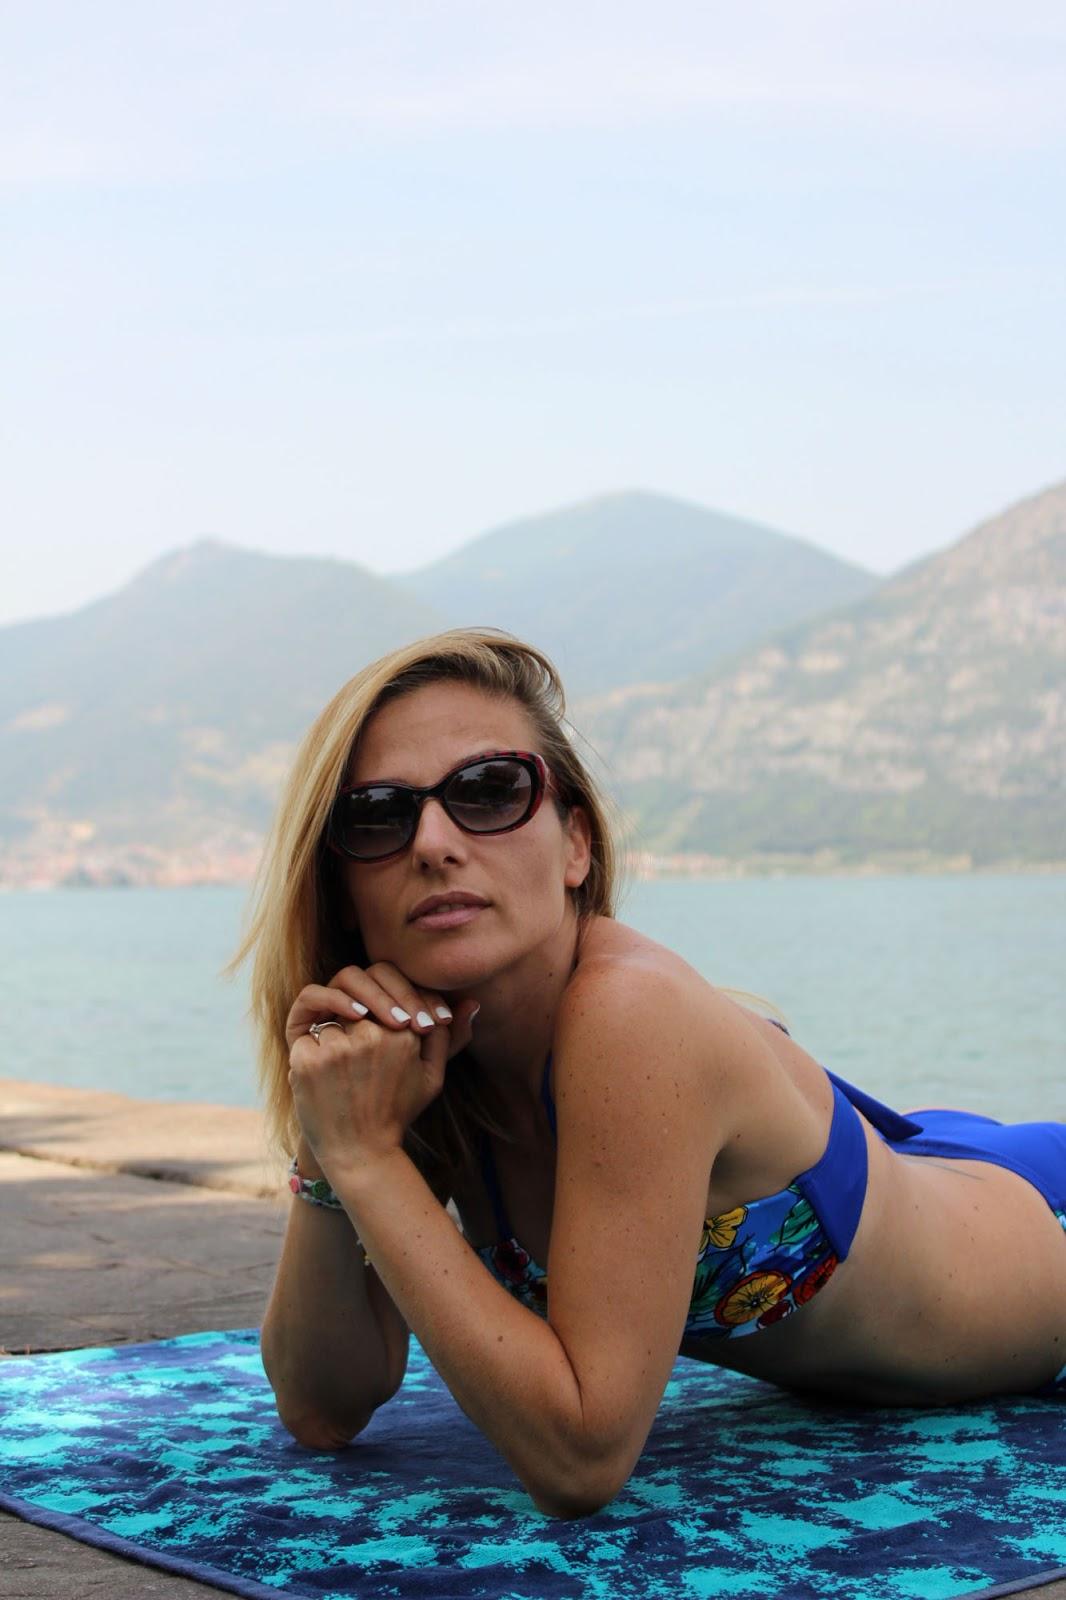 Eniwhere Fashion - Yamamay - Taormina bikini